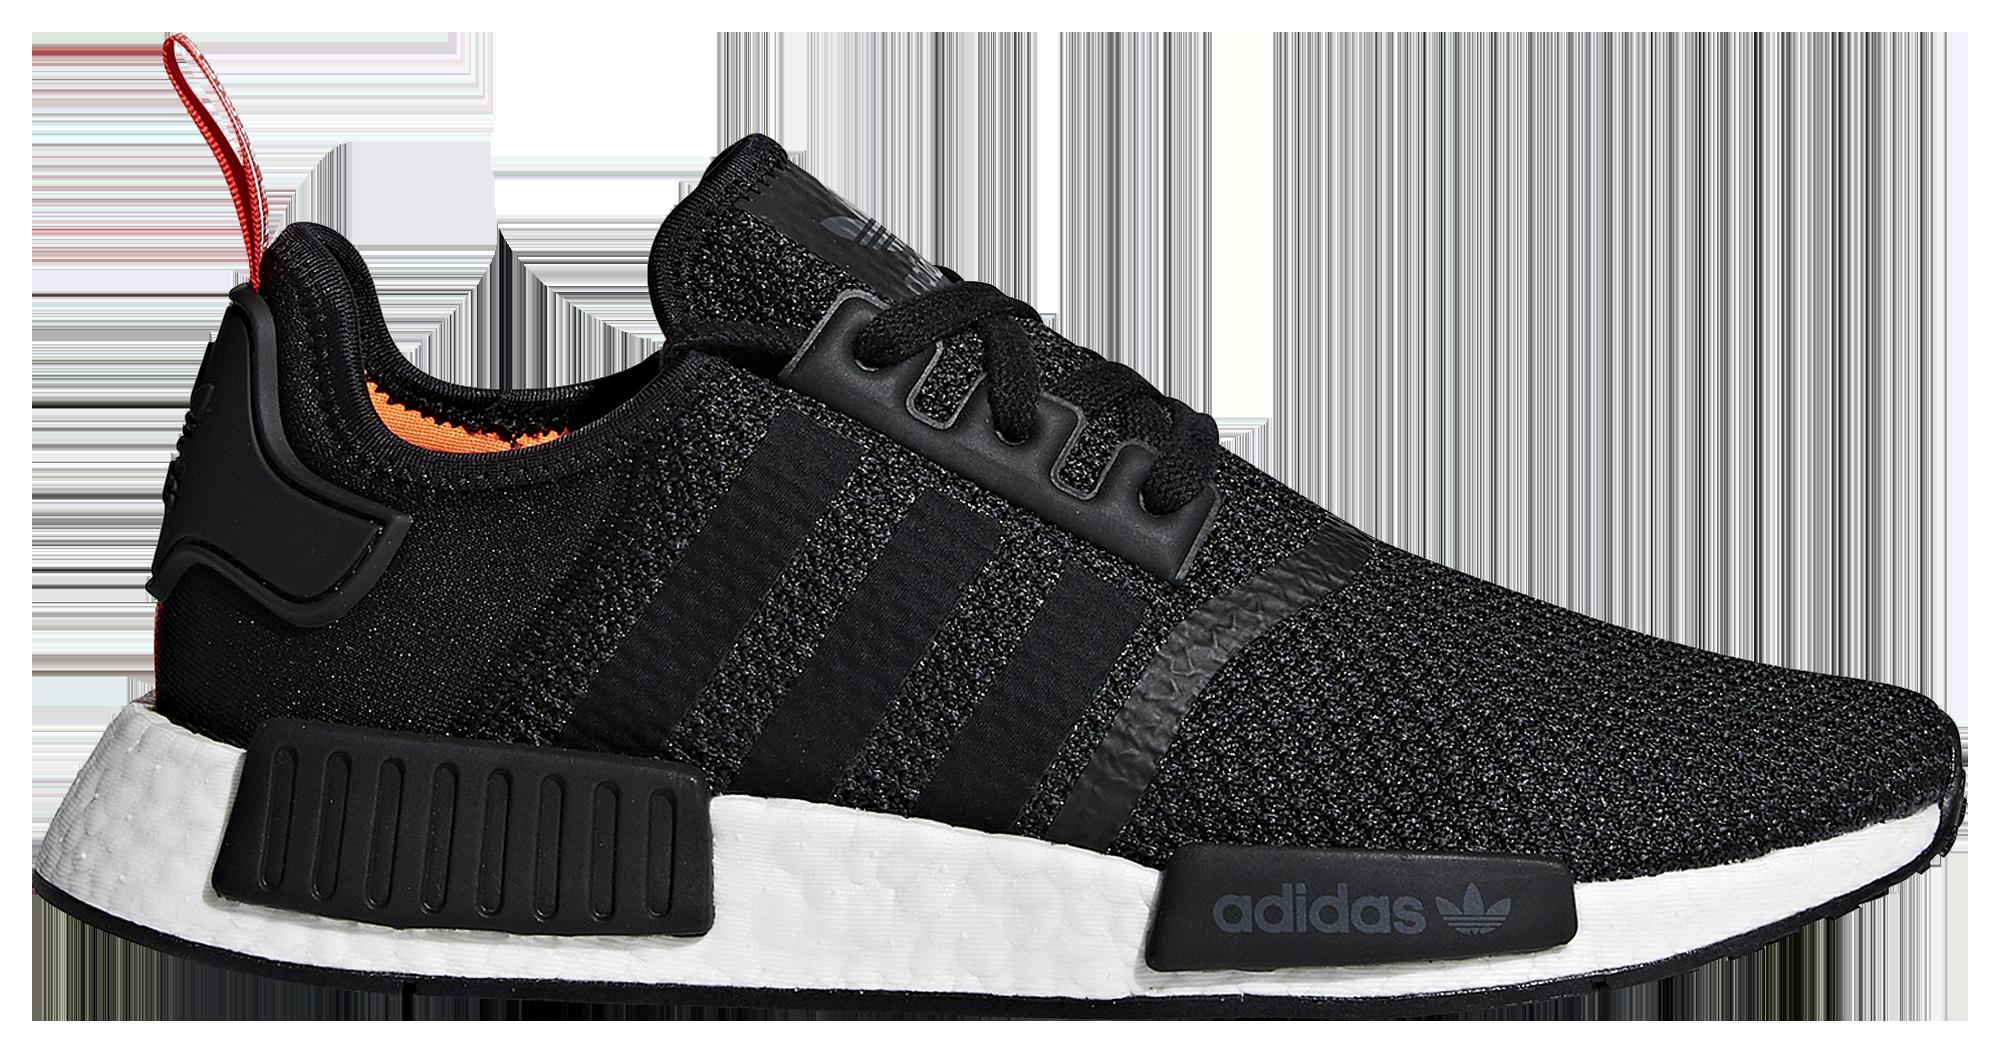 Adidas originali nmd r1 uomini scarpe casual nero / bianco / arancio